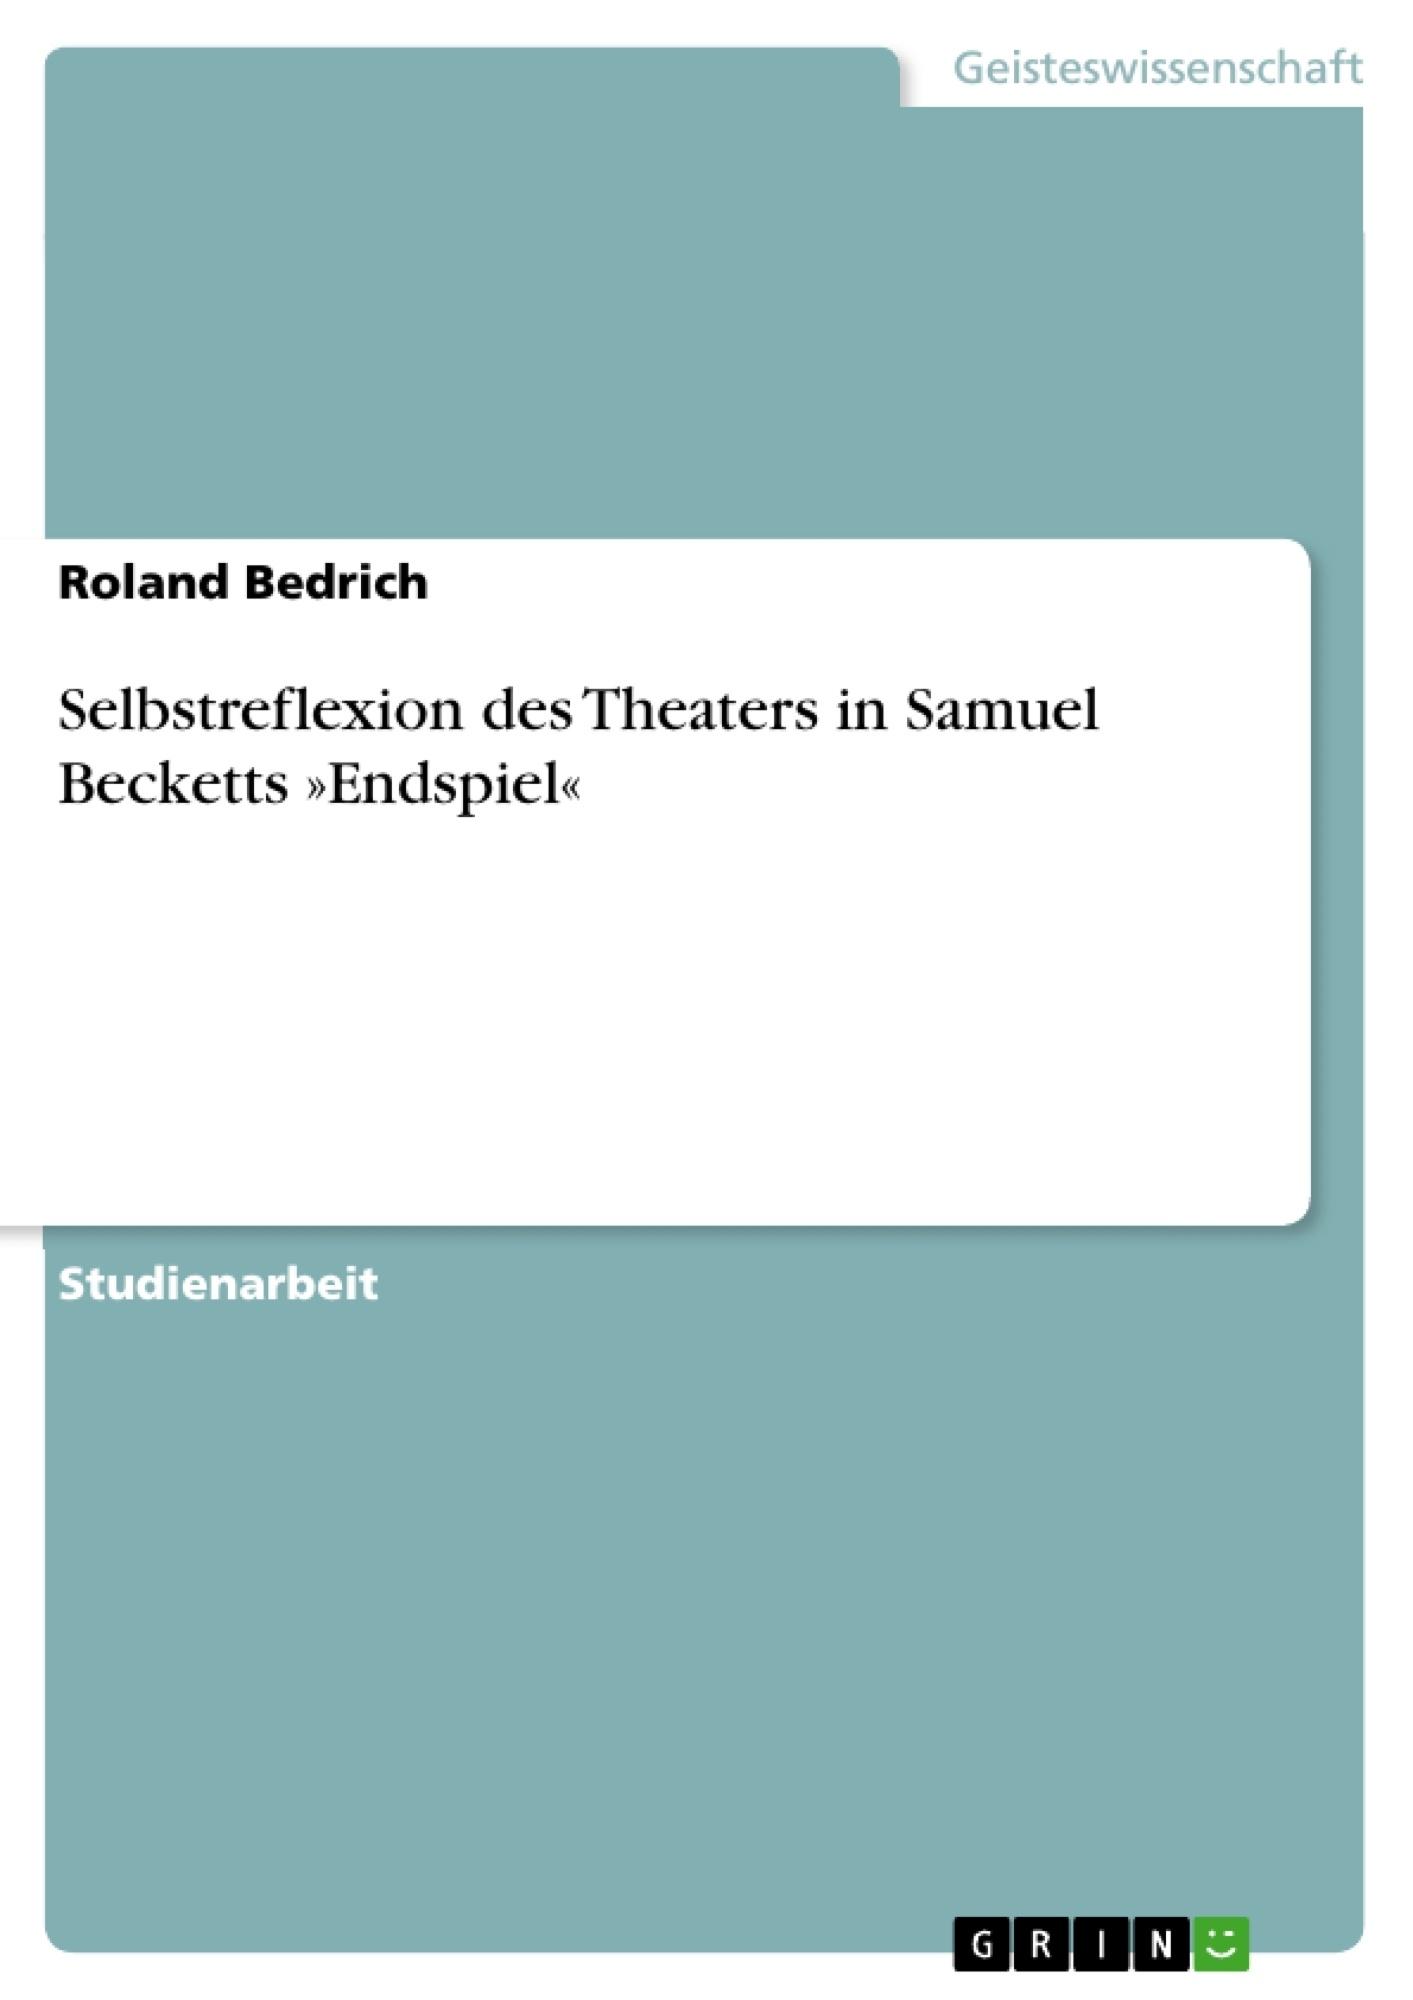 Titel: Selbstreflexion des Theaters in Samuel Becketts »Endspiel«